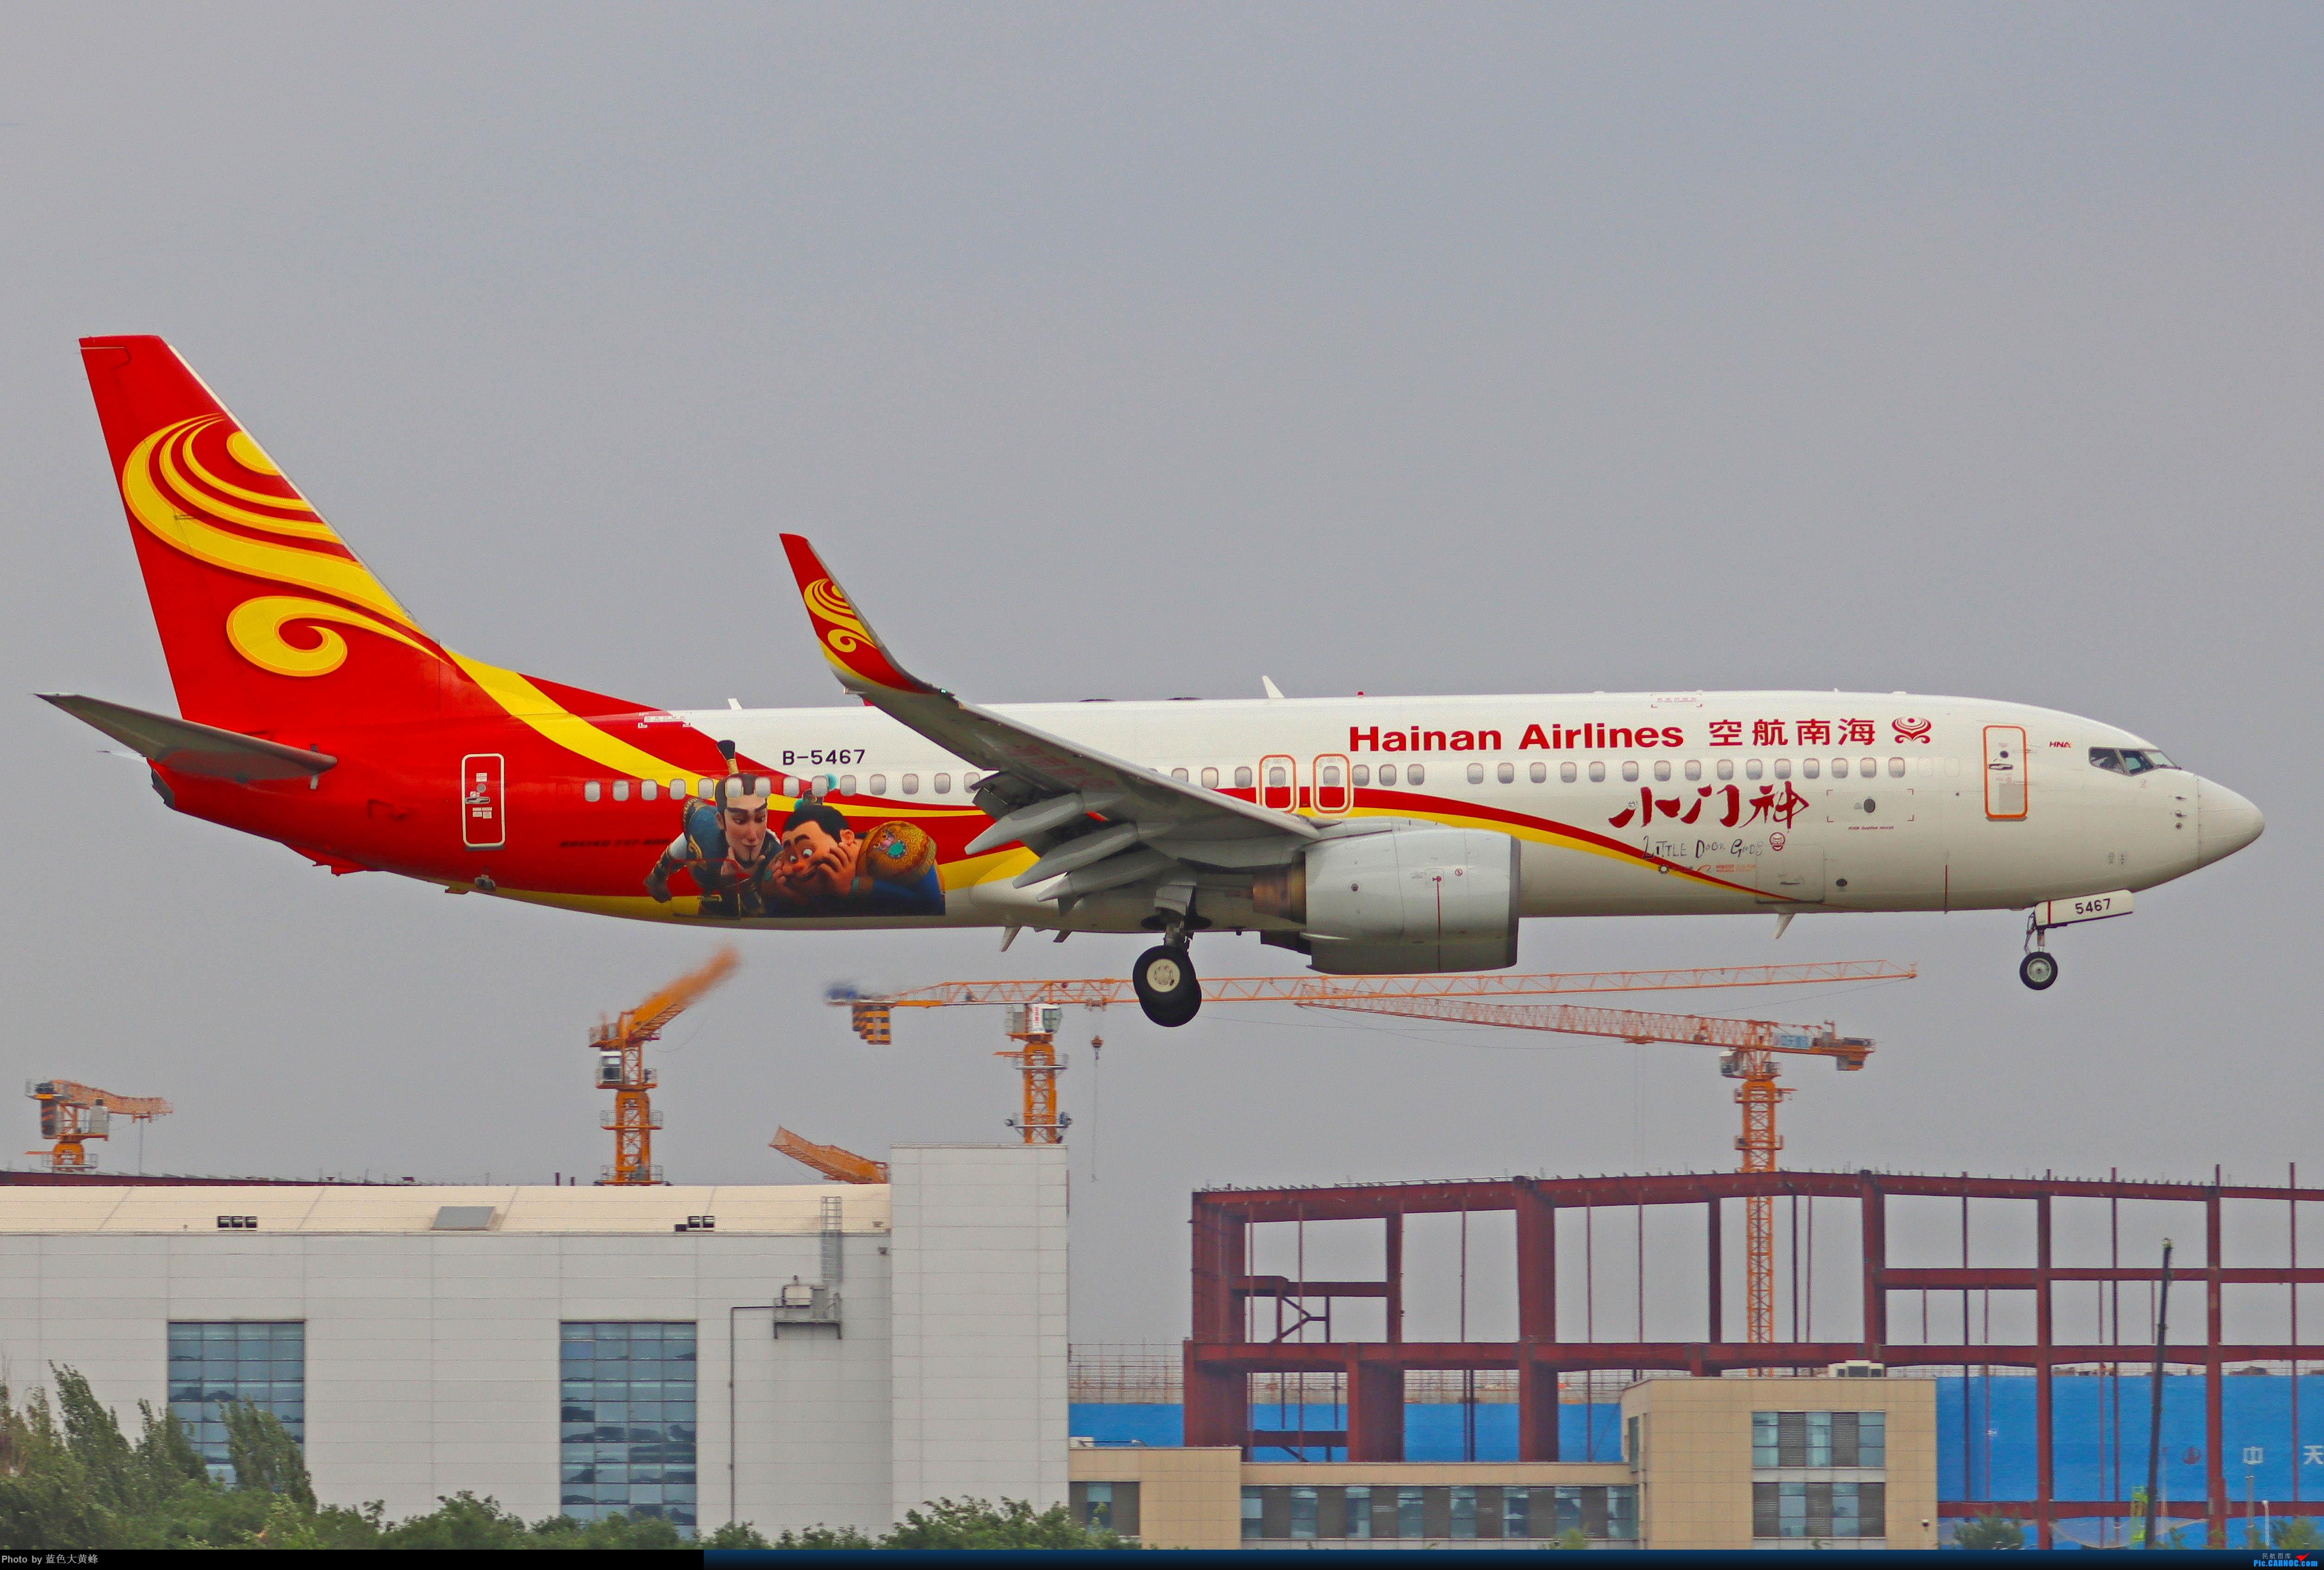 Re:[原创]2020.5.30PEK拍机,偶遇联邦的MD11给18R降落,实属罕见 BOEING 737-800 B-5467 中国北京首都国际机场